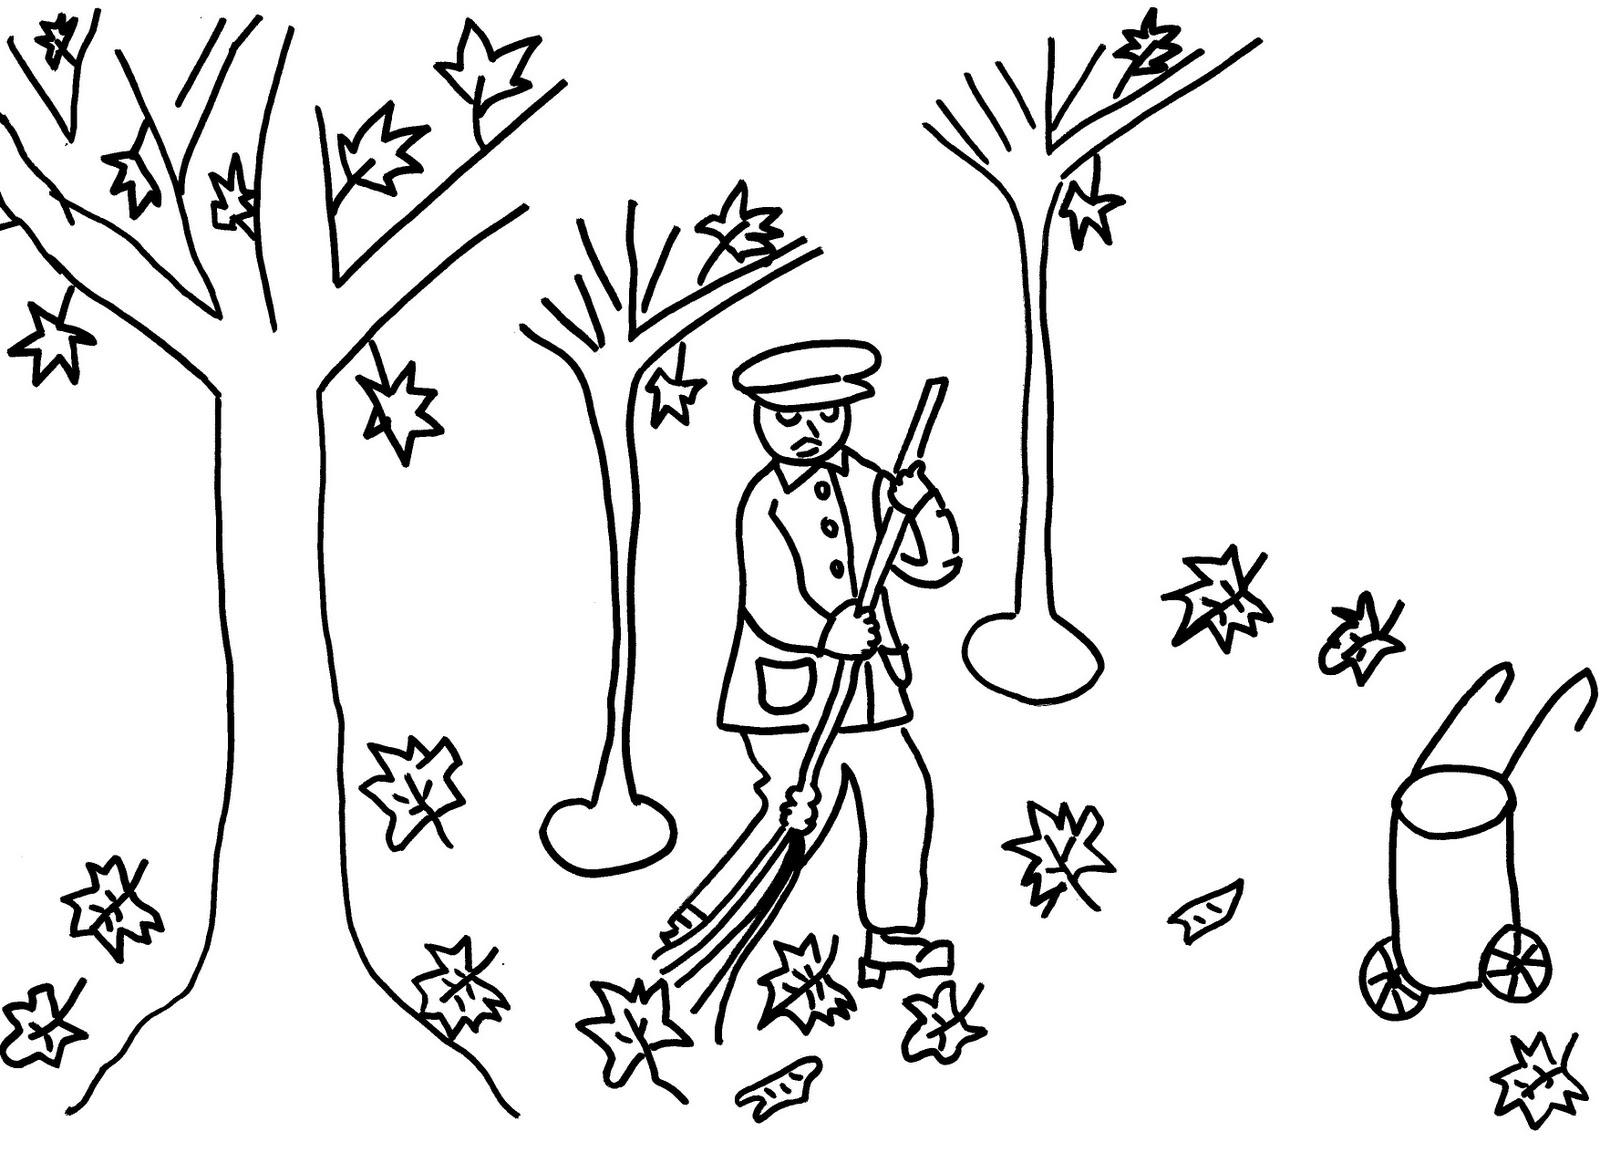 Dibujos Para Nios De Educacion Inicial   newhairstylesformen2014.com